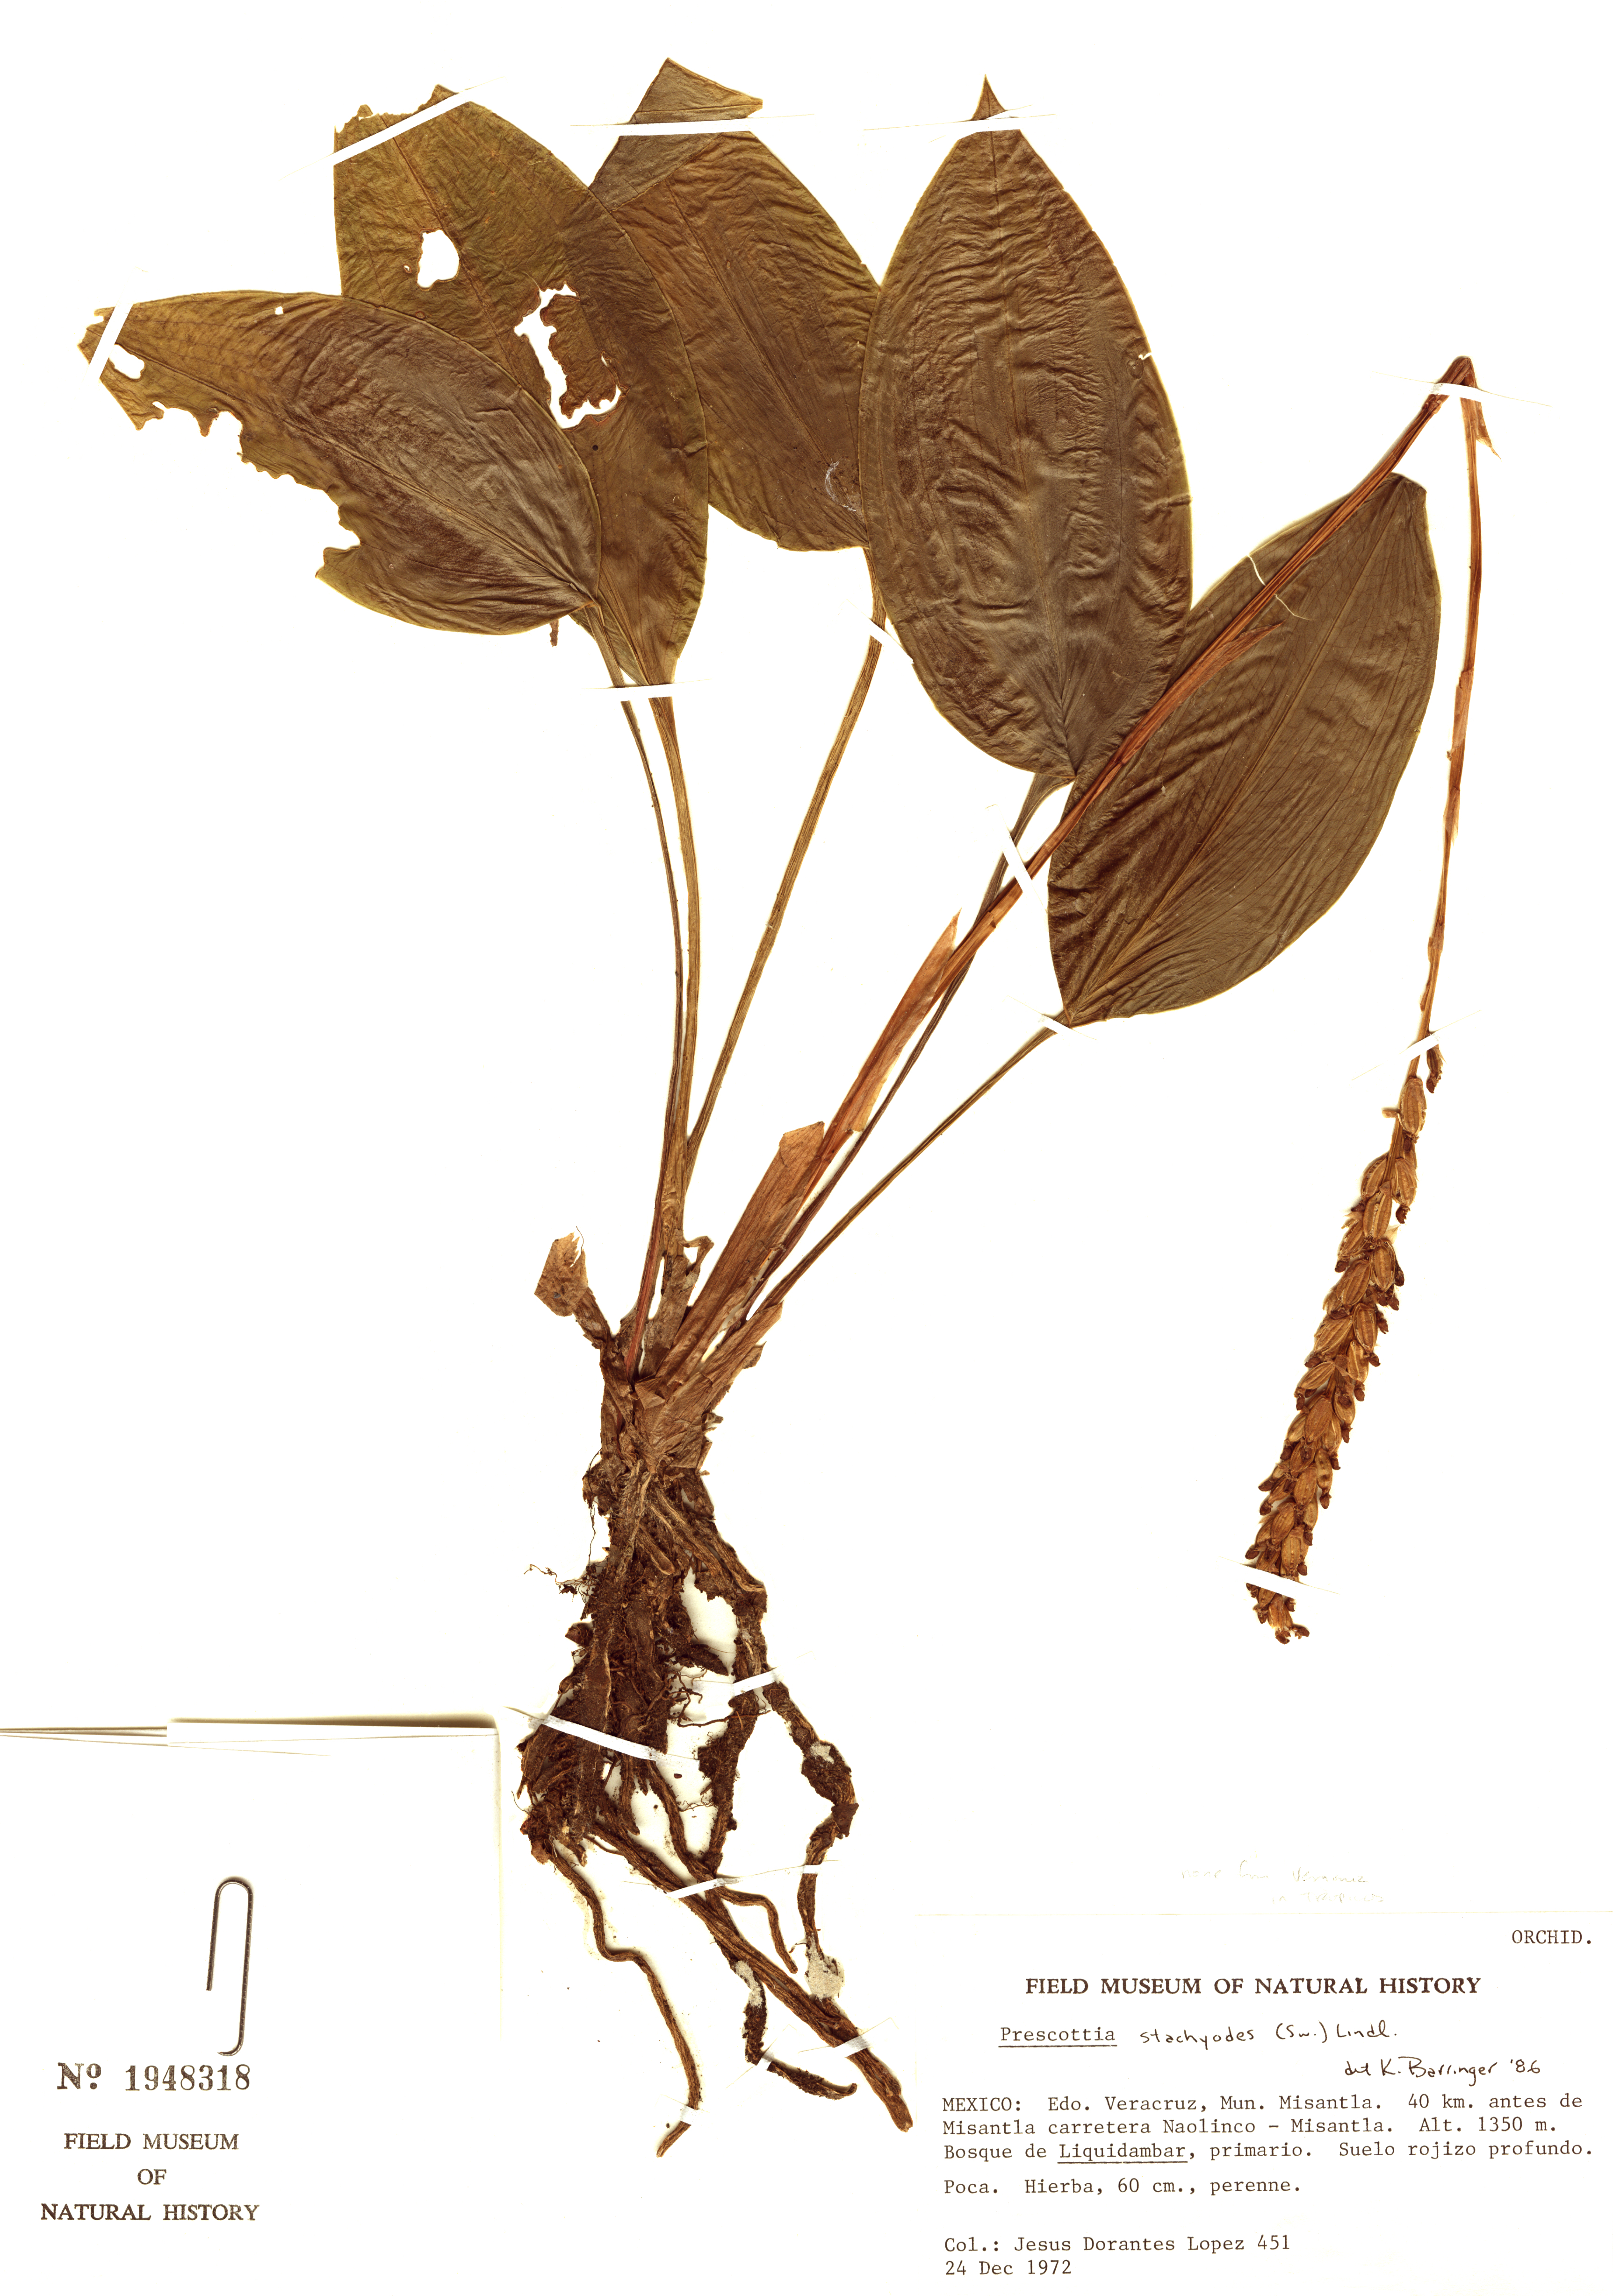 Specimen: Prescottia stachyodes